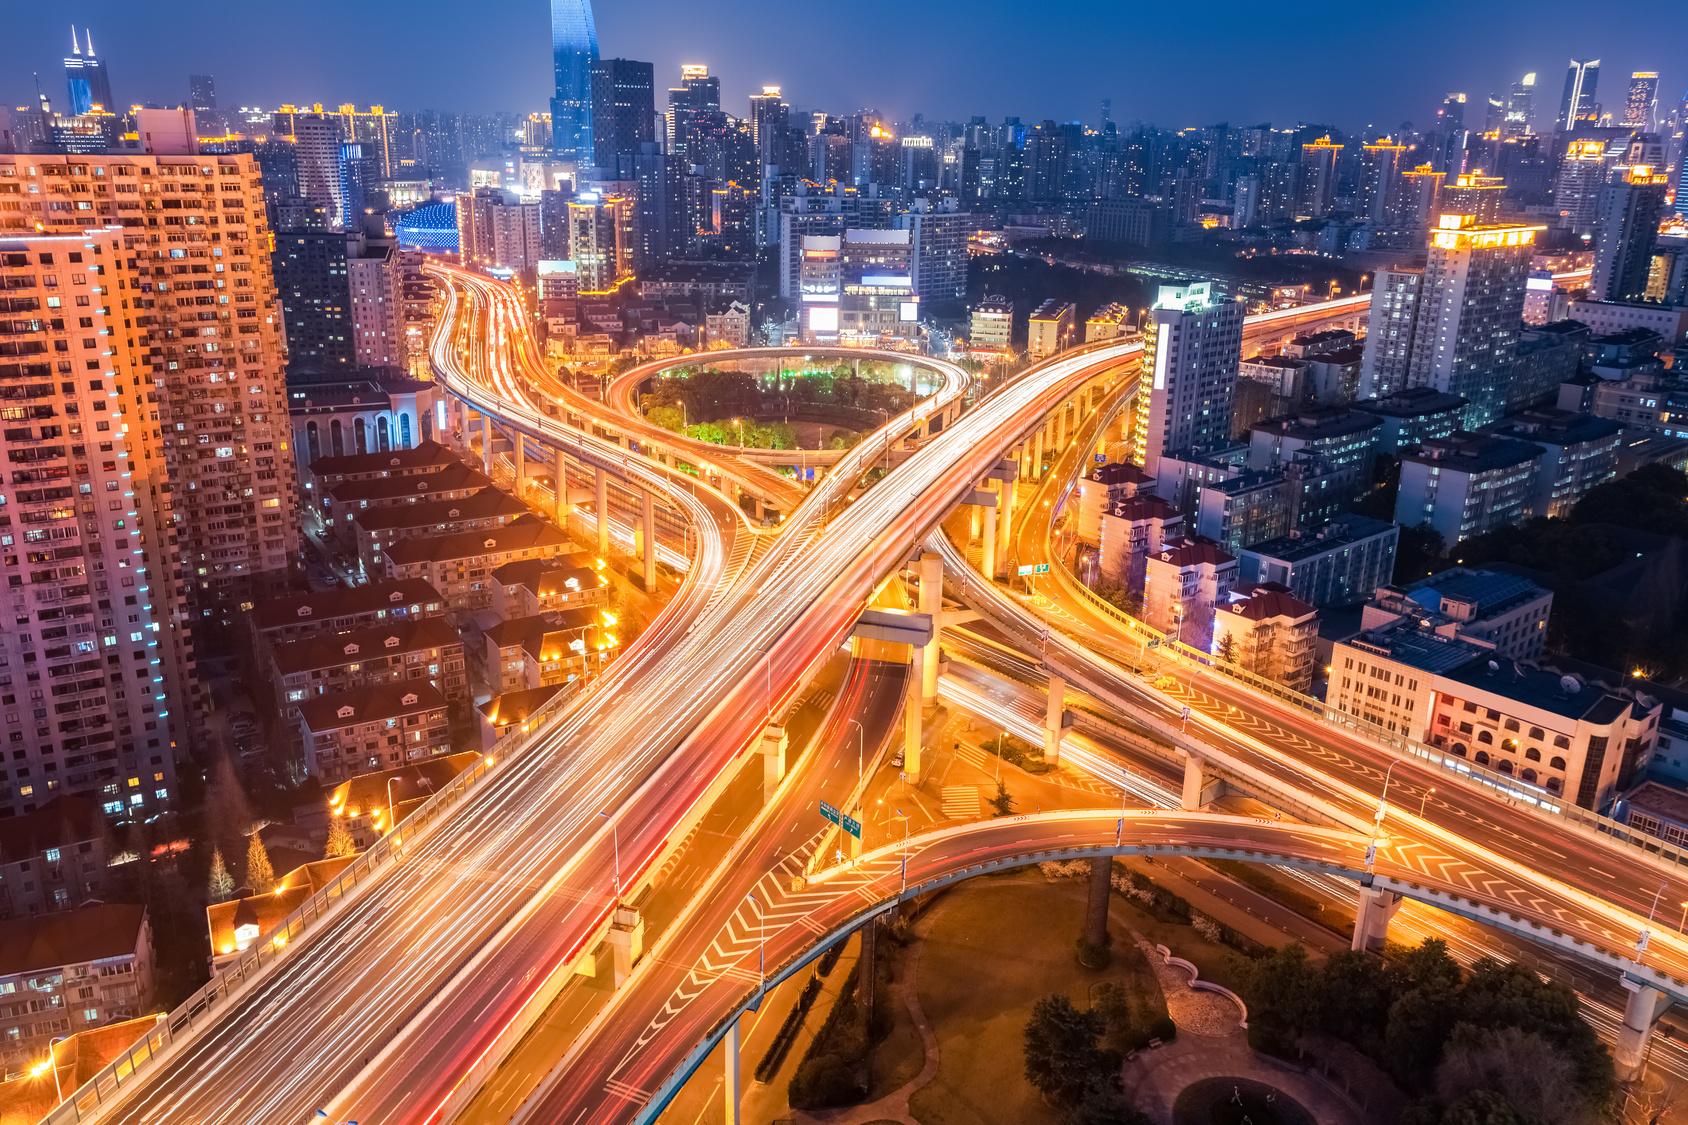 High Risk Auto Insurance >> Federal legislation on driverless cars speeds up - Accenture Insurance Blog